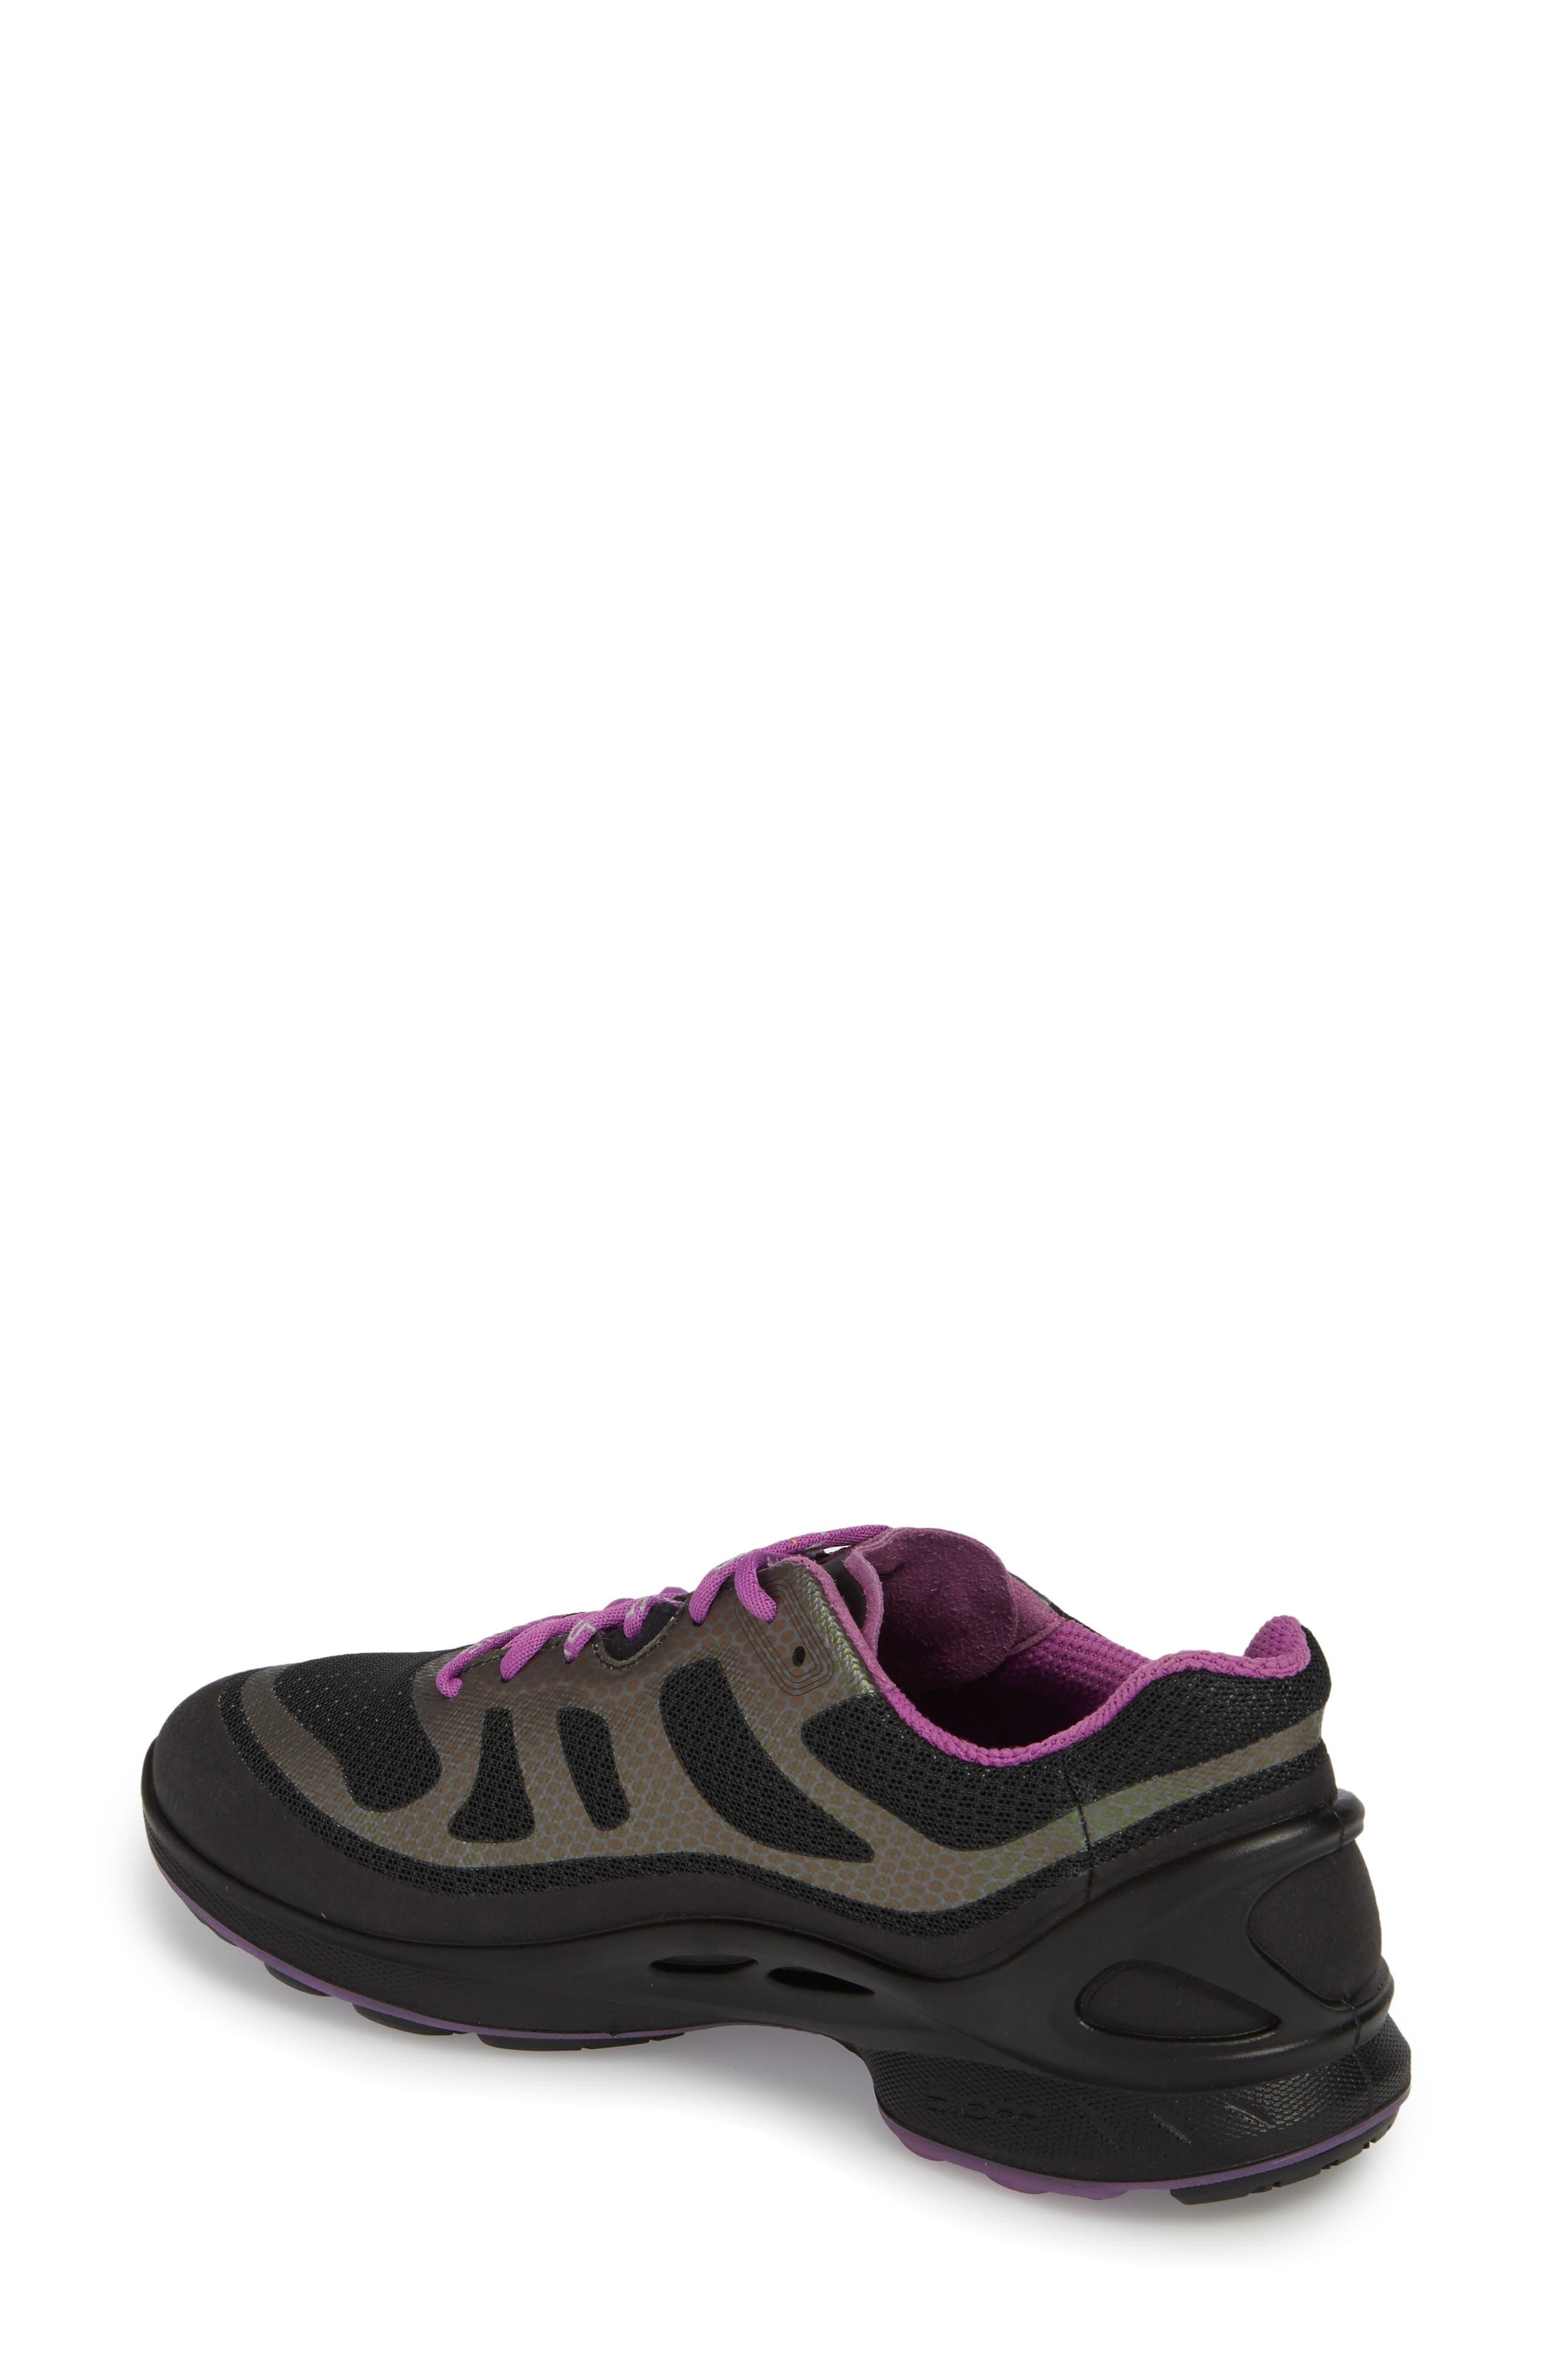 BIOM Fjuel Tie Sneaker,                             Alternate thumbnail 2, color,                             BLACK FABRIC